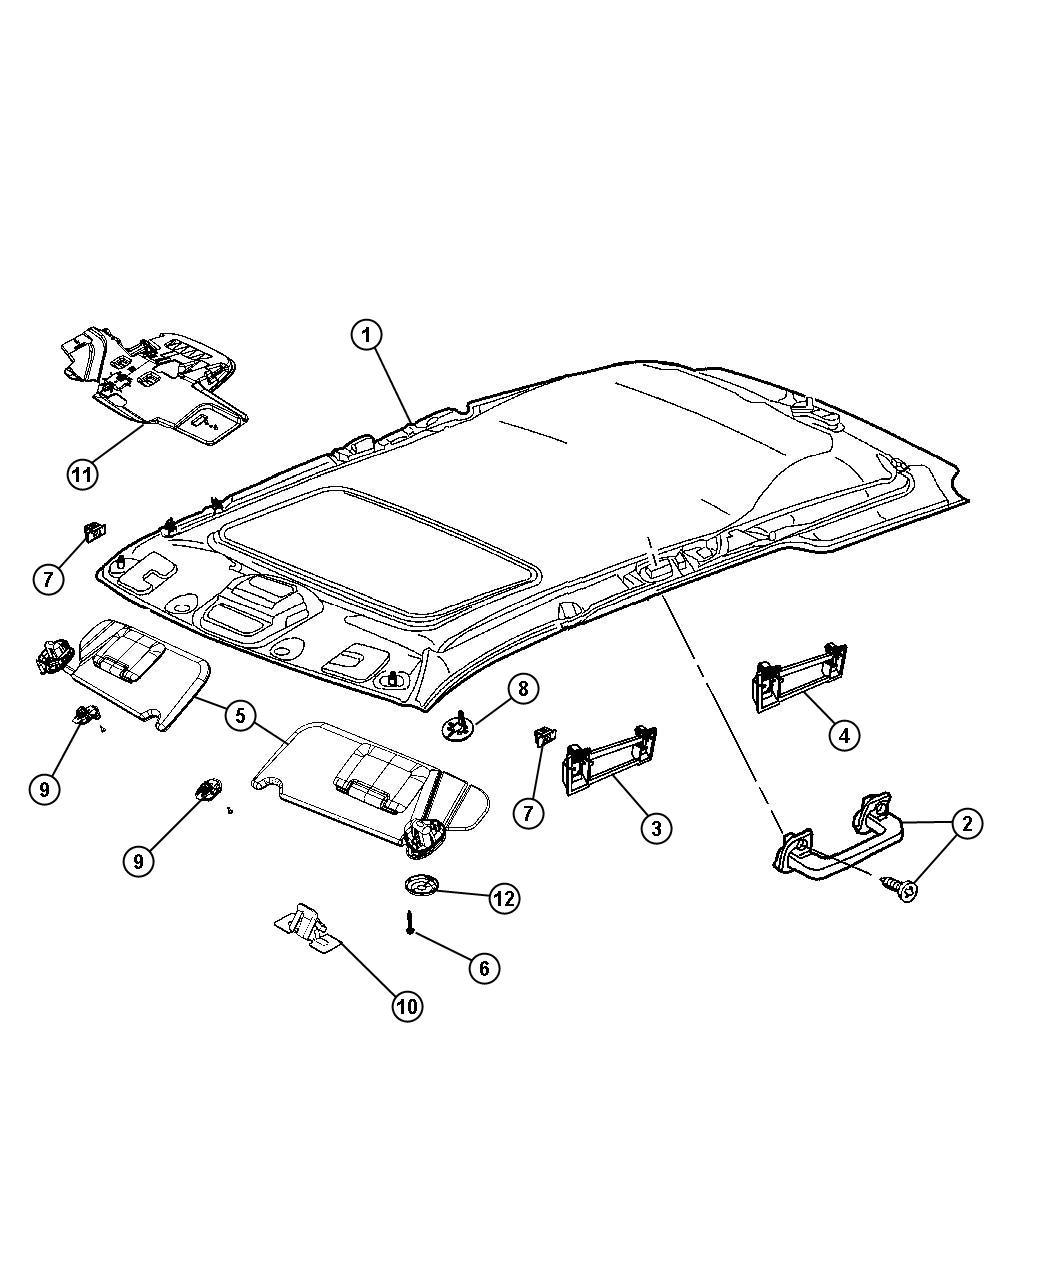 2011 jeep grand cherokee interior parts diagram jeep auto wiring diagram. Black Bedroom Furniture Sets. Home Design Ideas